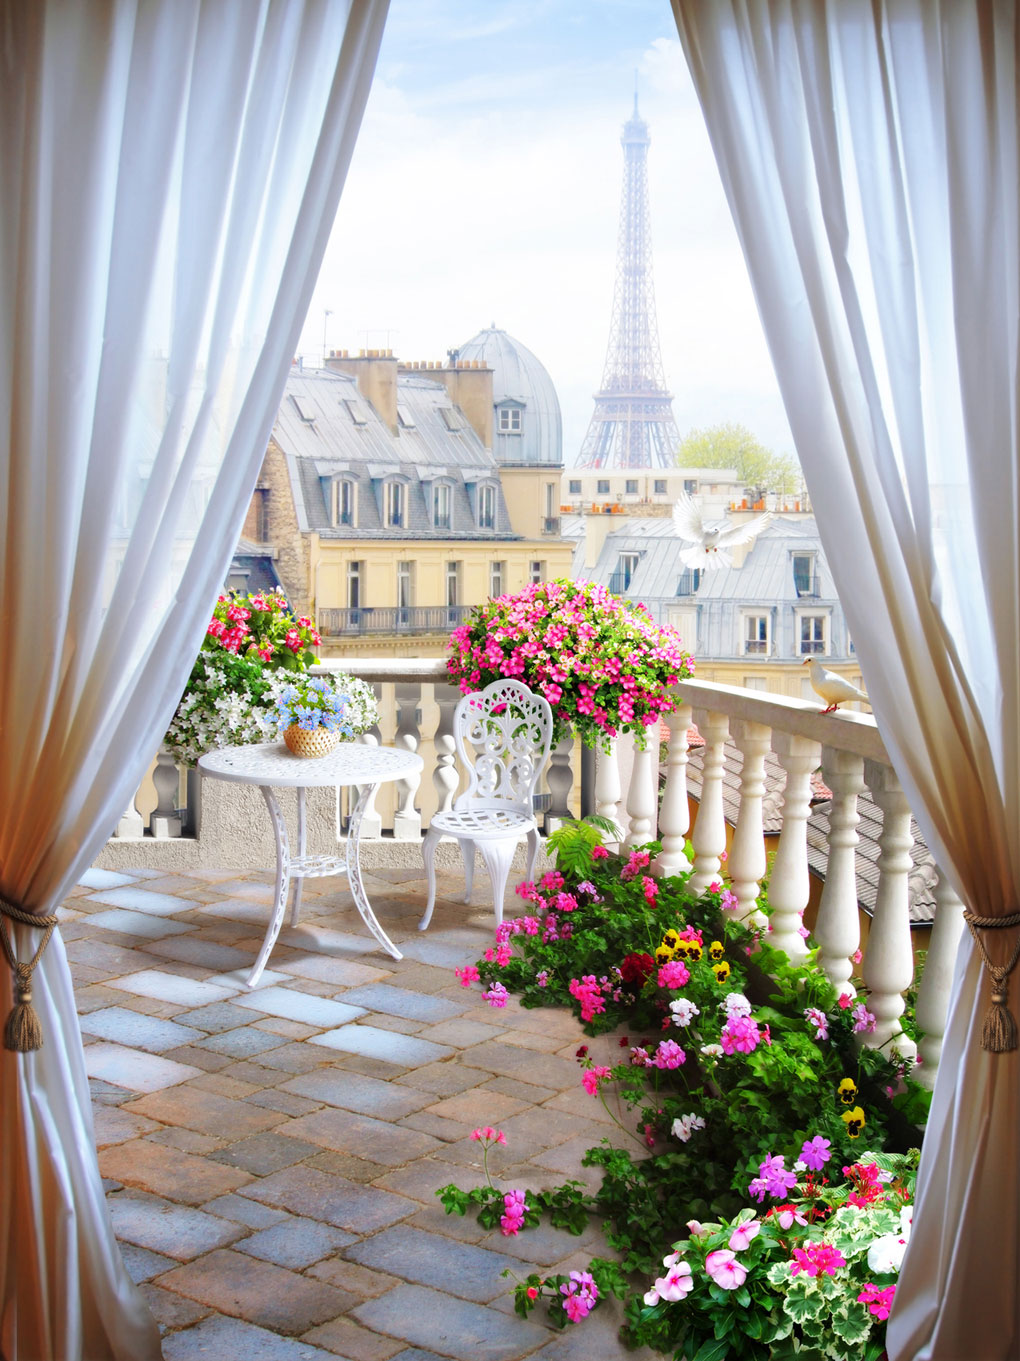 Фотообои фрески террасы балконы каталог фото.